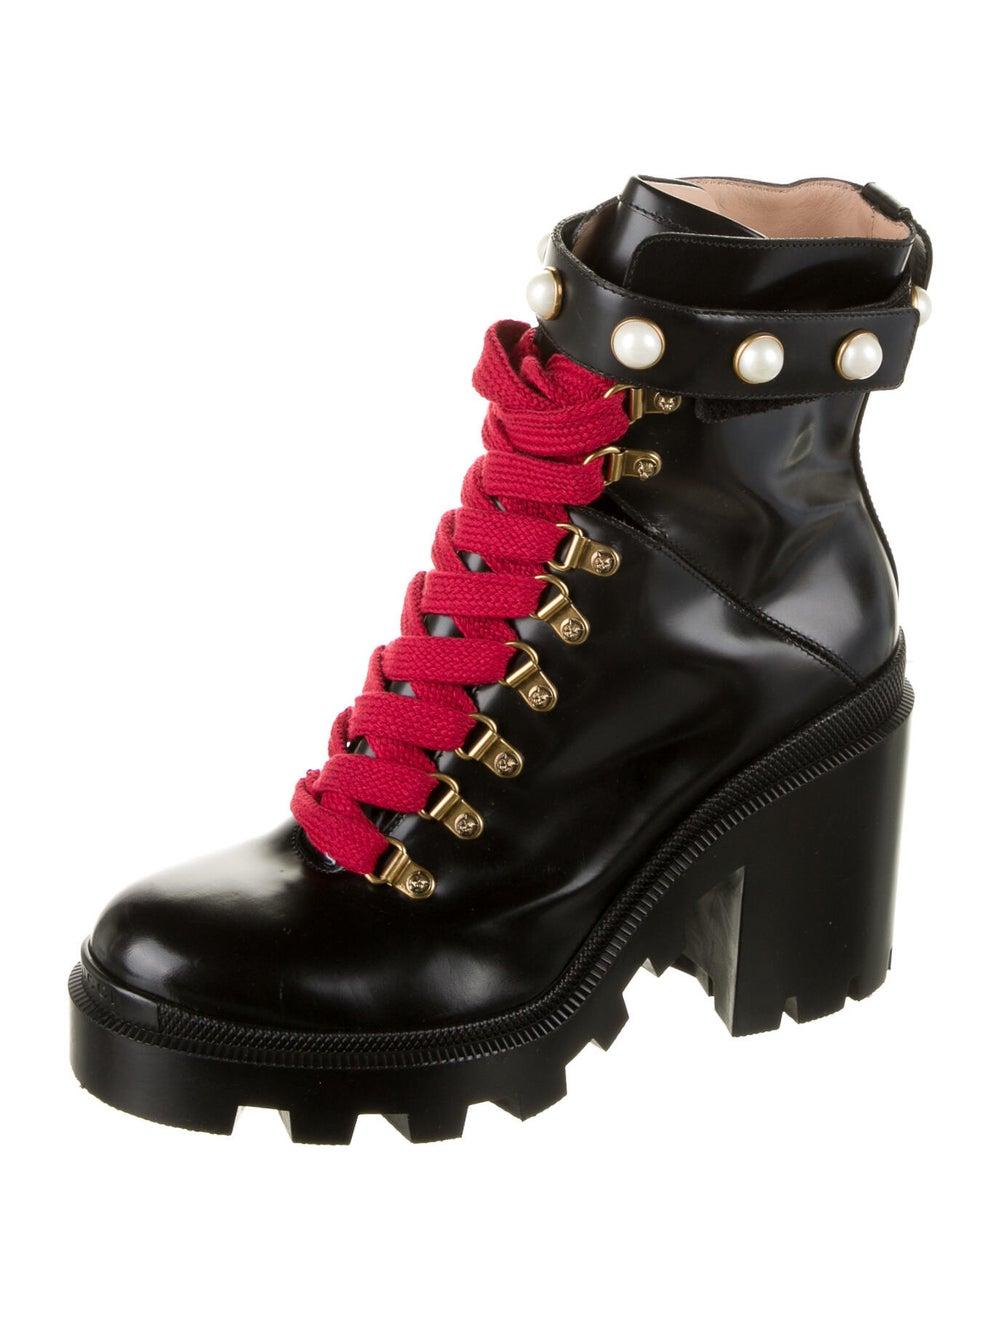 Gucci Trip Leather Combat Boots Black - image 2